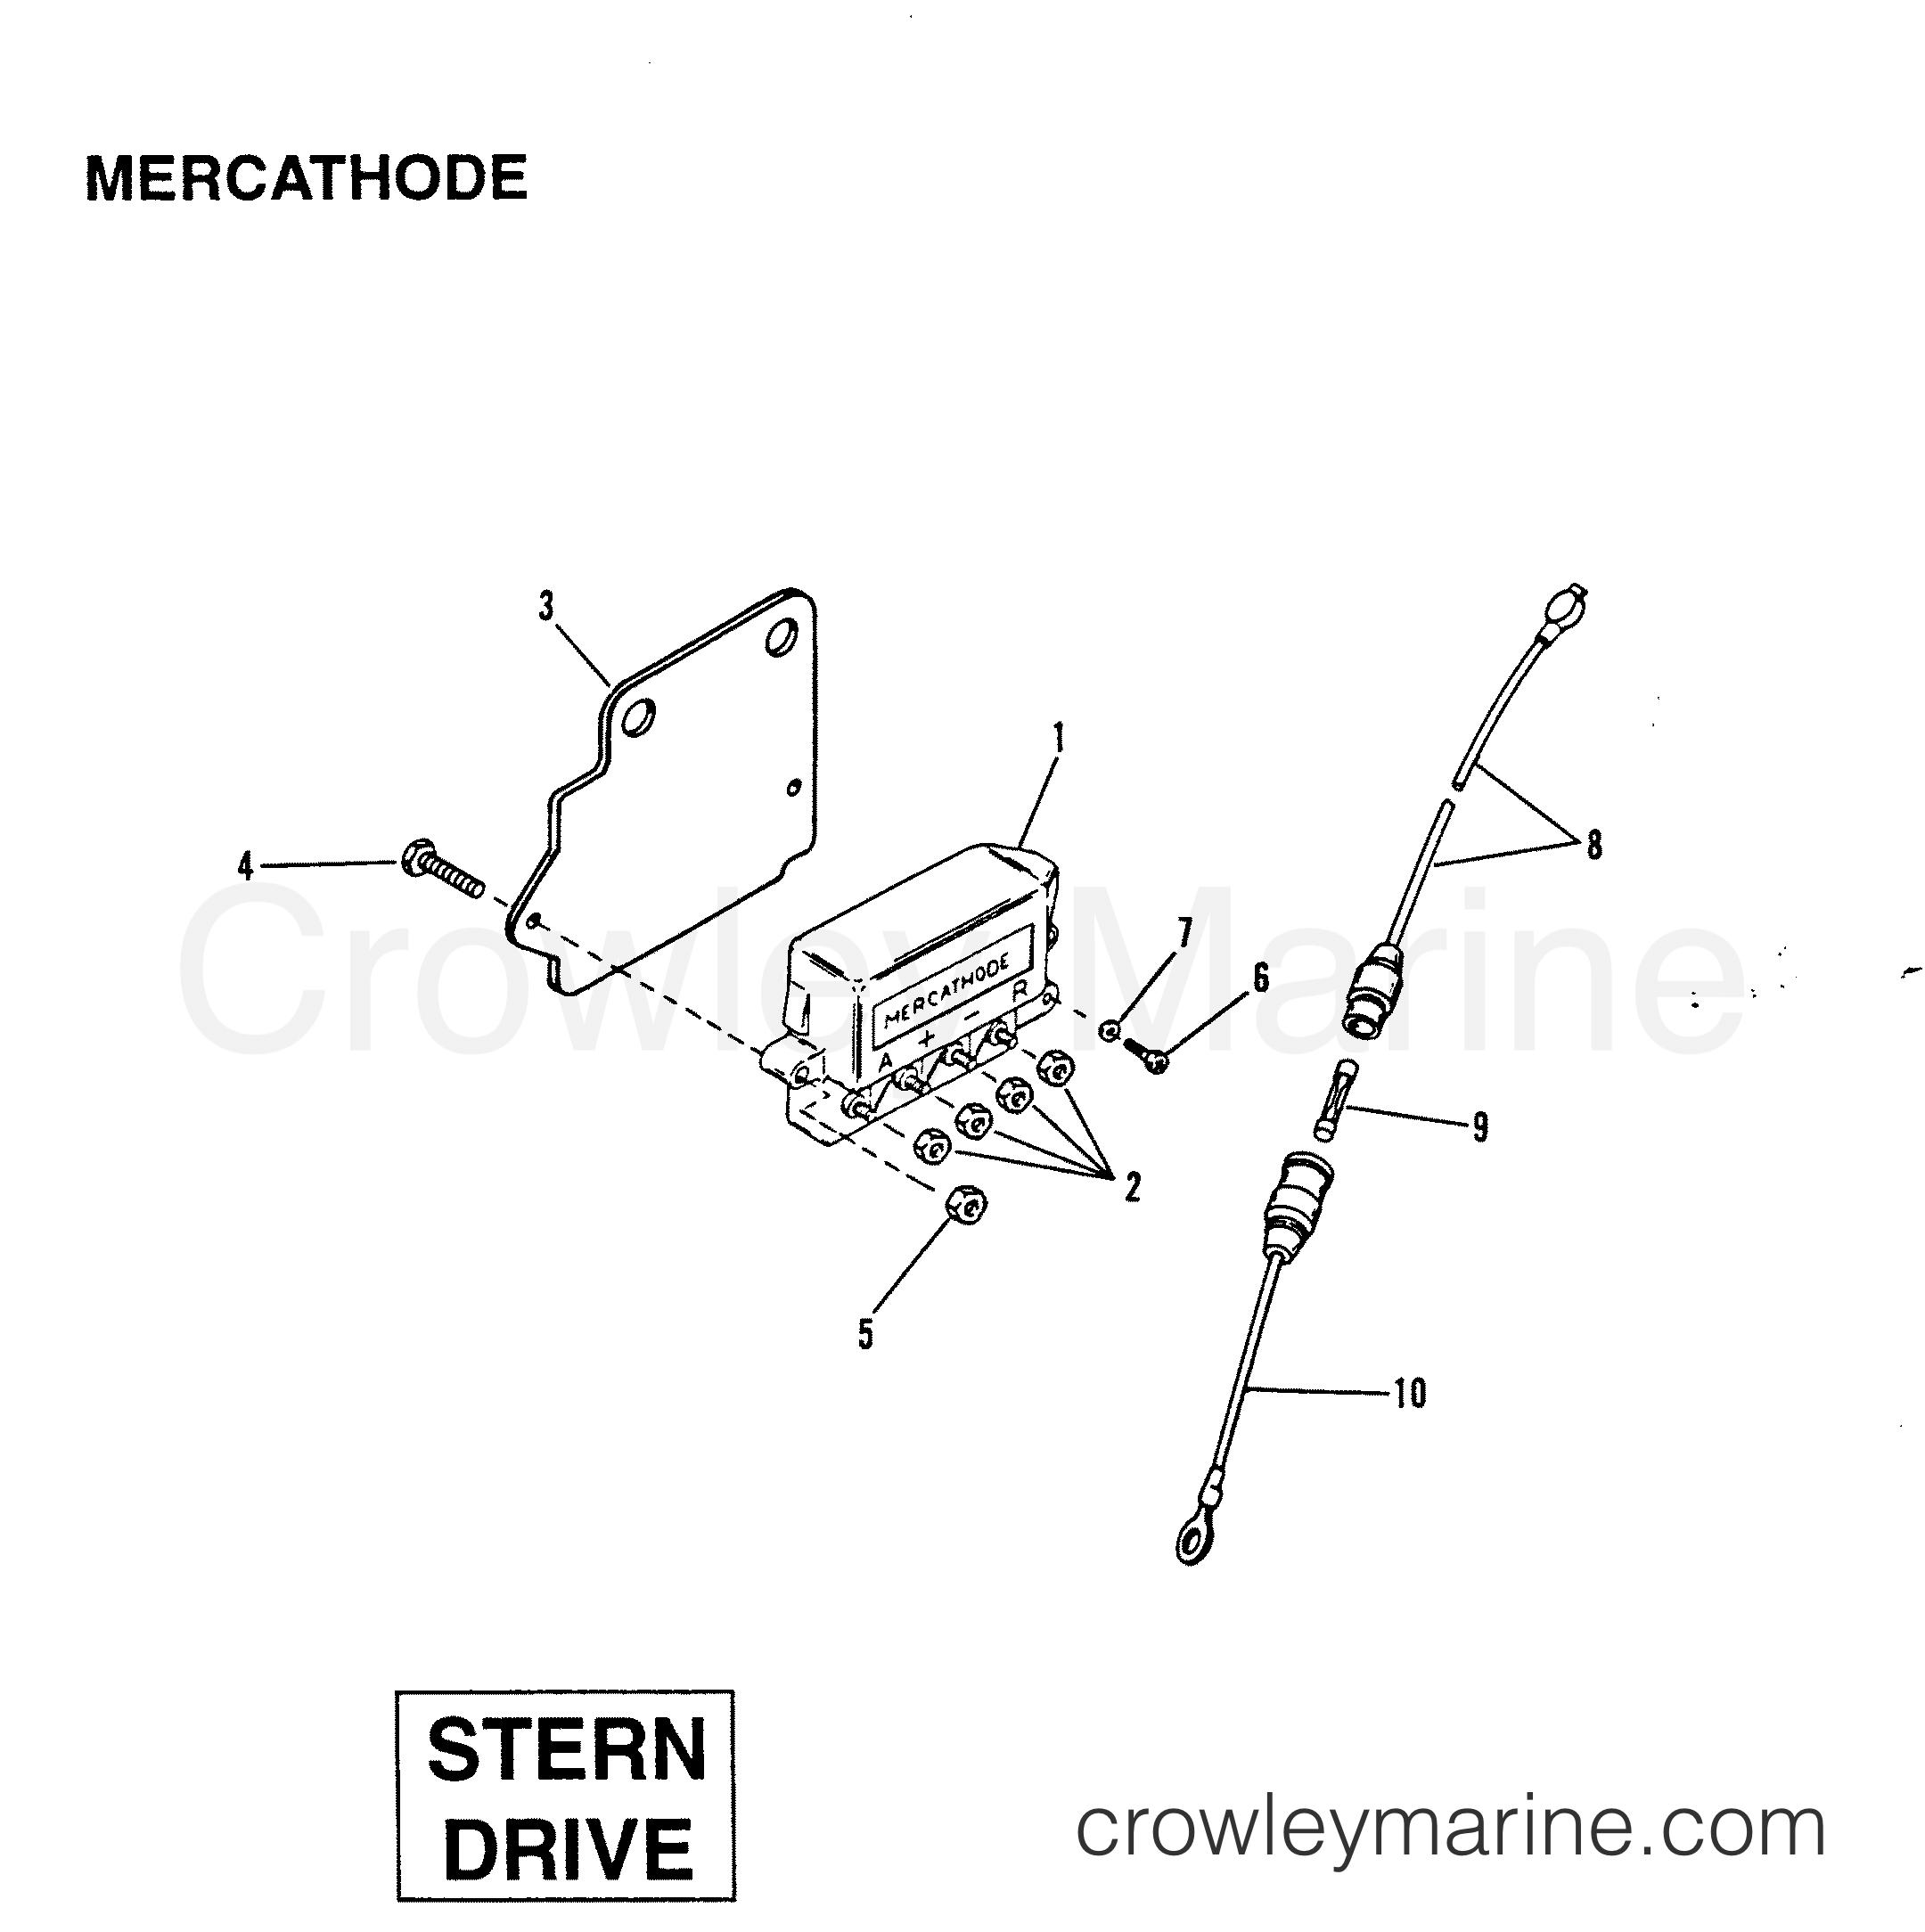 1991 Mercury Inboard Engine 642D - 34232C5DD MERCATHODE (STERN DRIVE) section